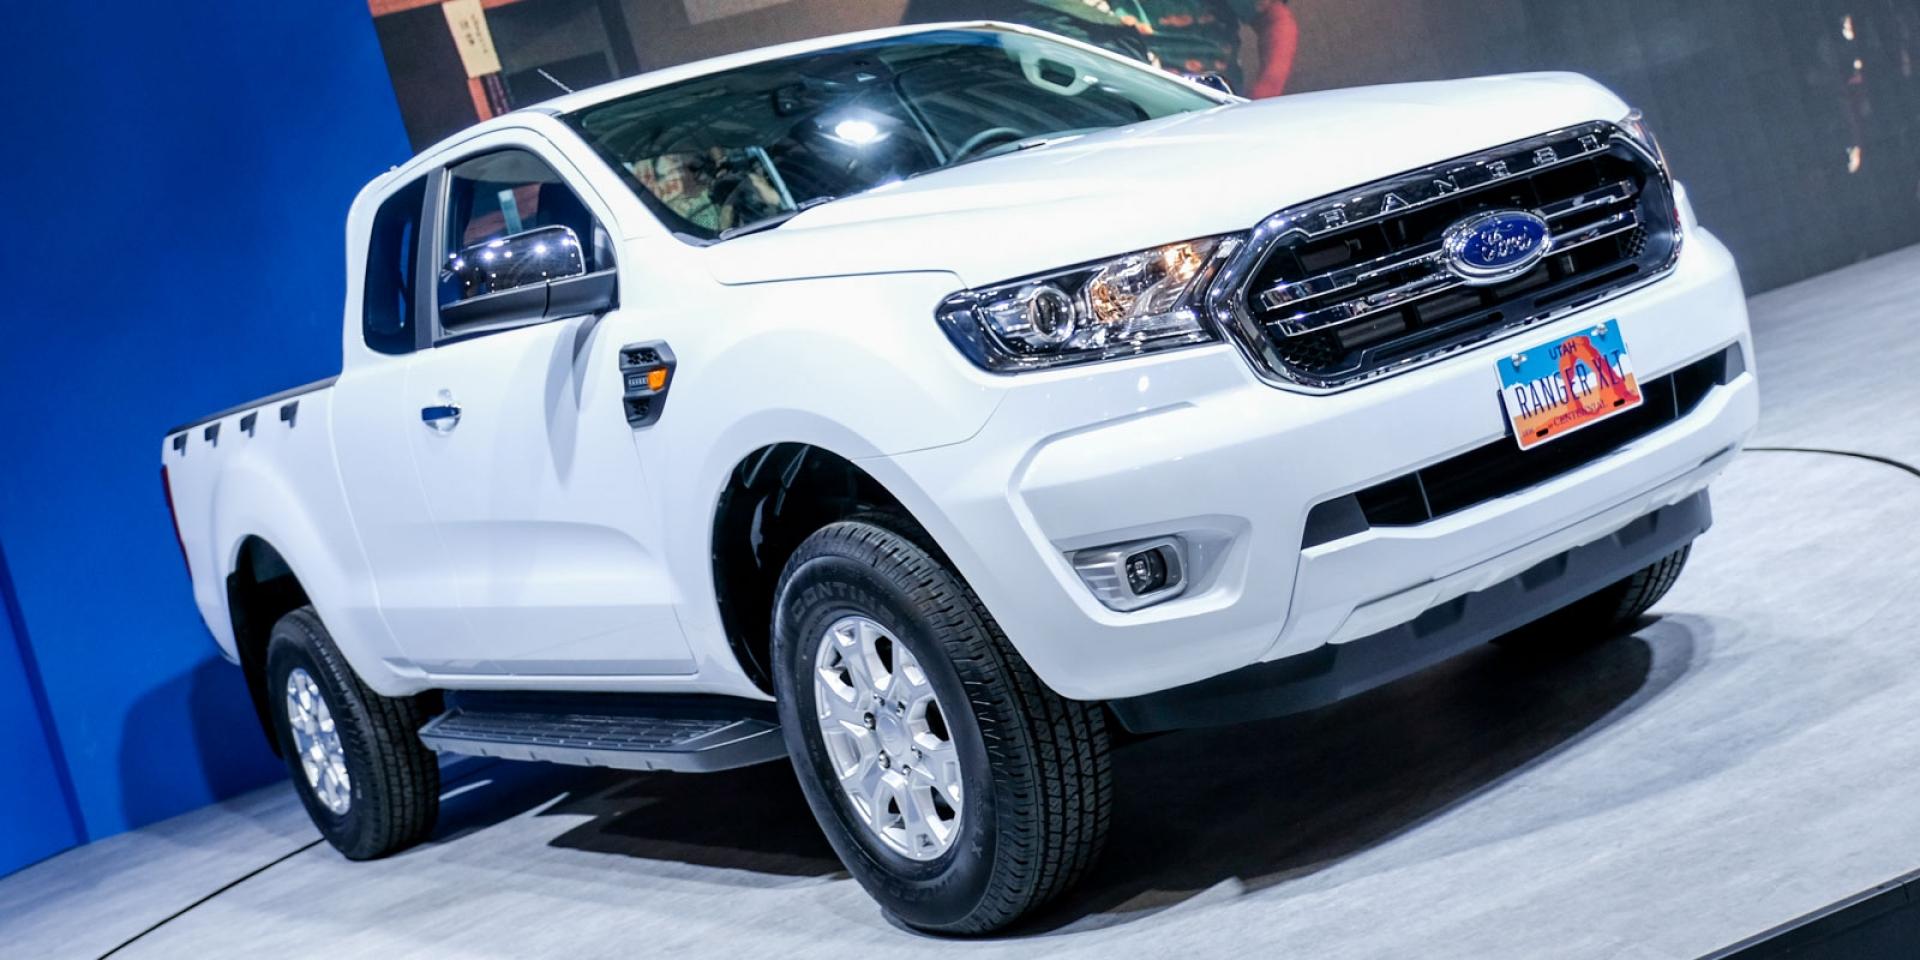 2020世界新車大展。Ford展區雙車發表,Tourneo Connect即將導入?